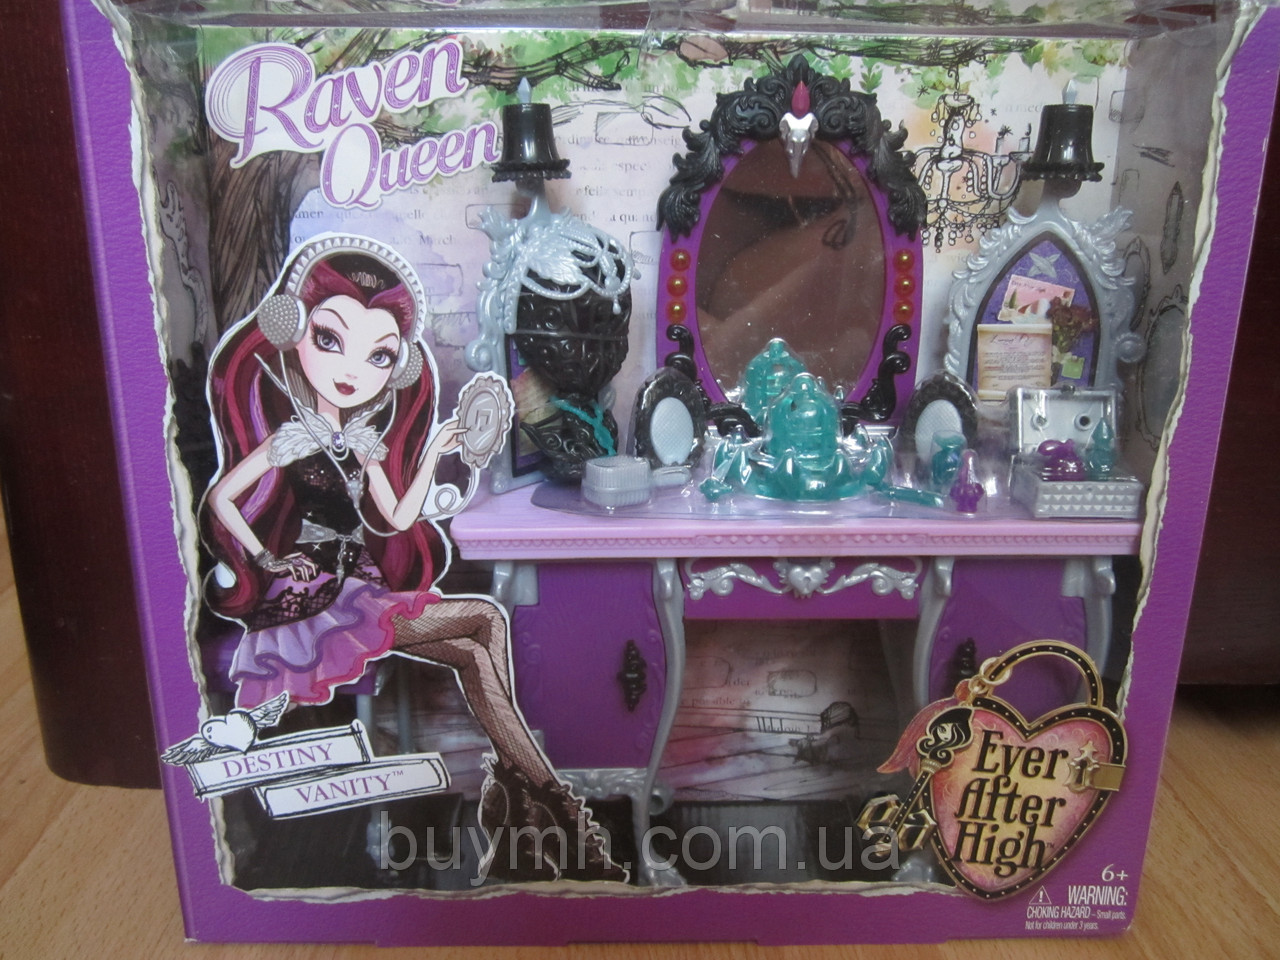 Туалетный столик Рейвен Квин Ever After High Getting Fairest Raven Queen Destiny Vanity Accessory, фото 1